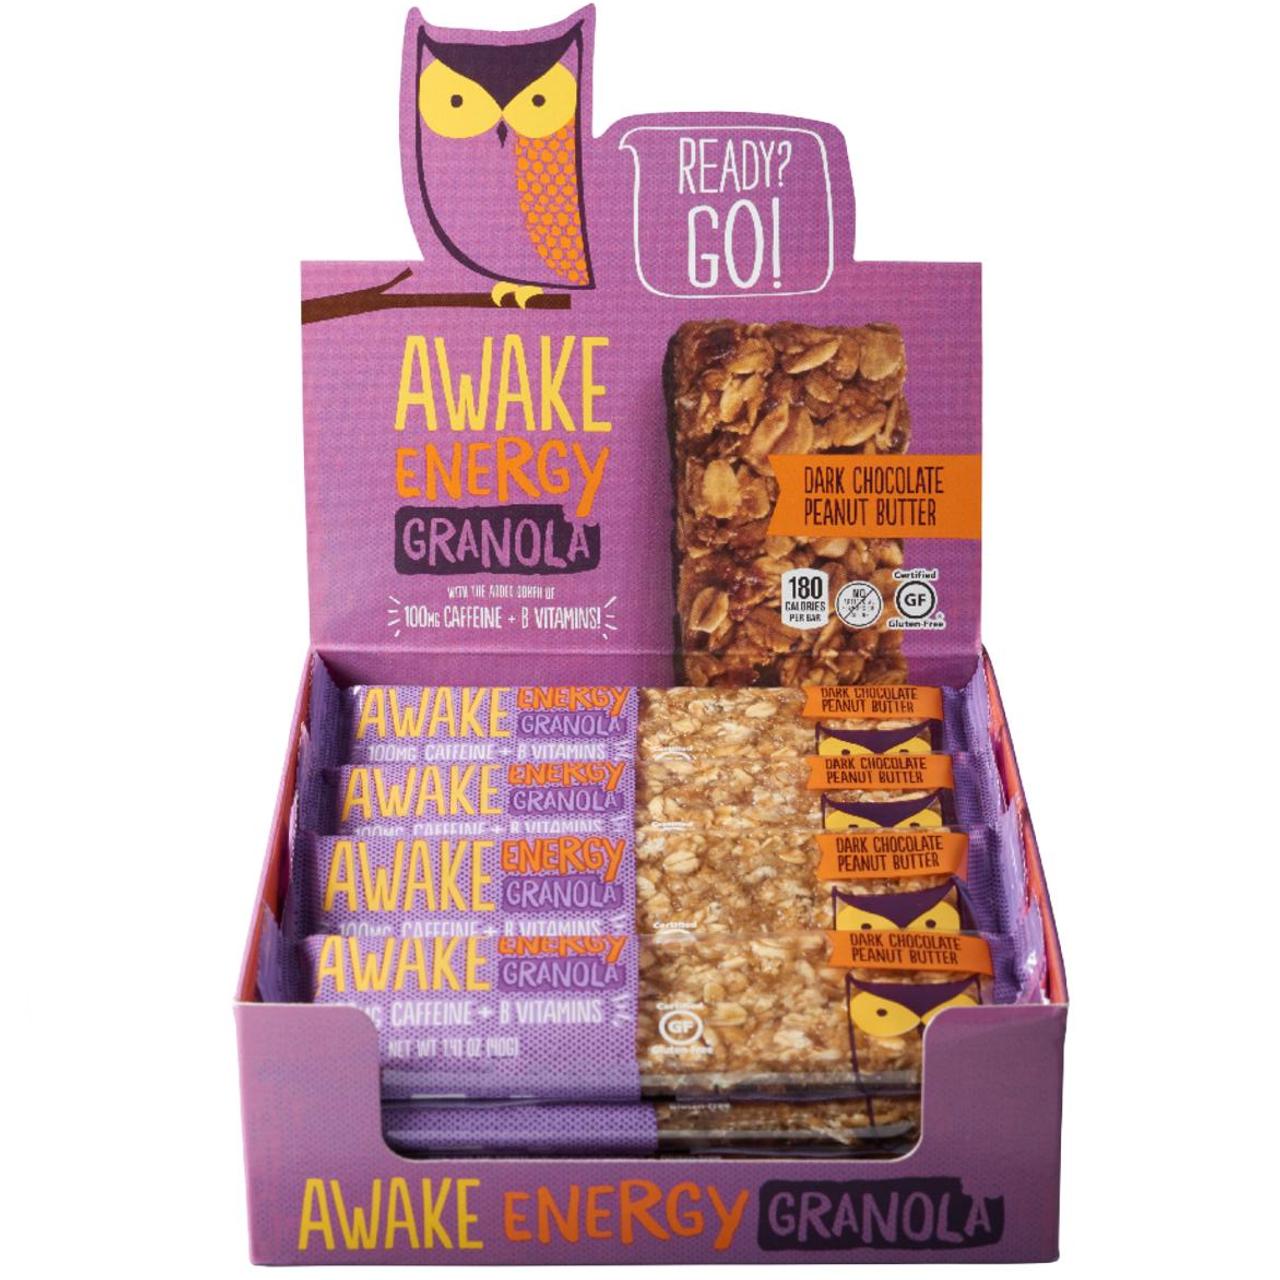 Awake Chocolate, Energy Granola Bars, Dark Chocolate Peanut Butter, 1.41 oz. (16 Count) - RocketDSD